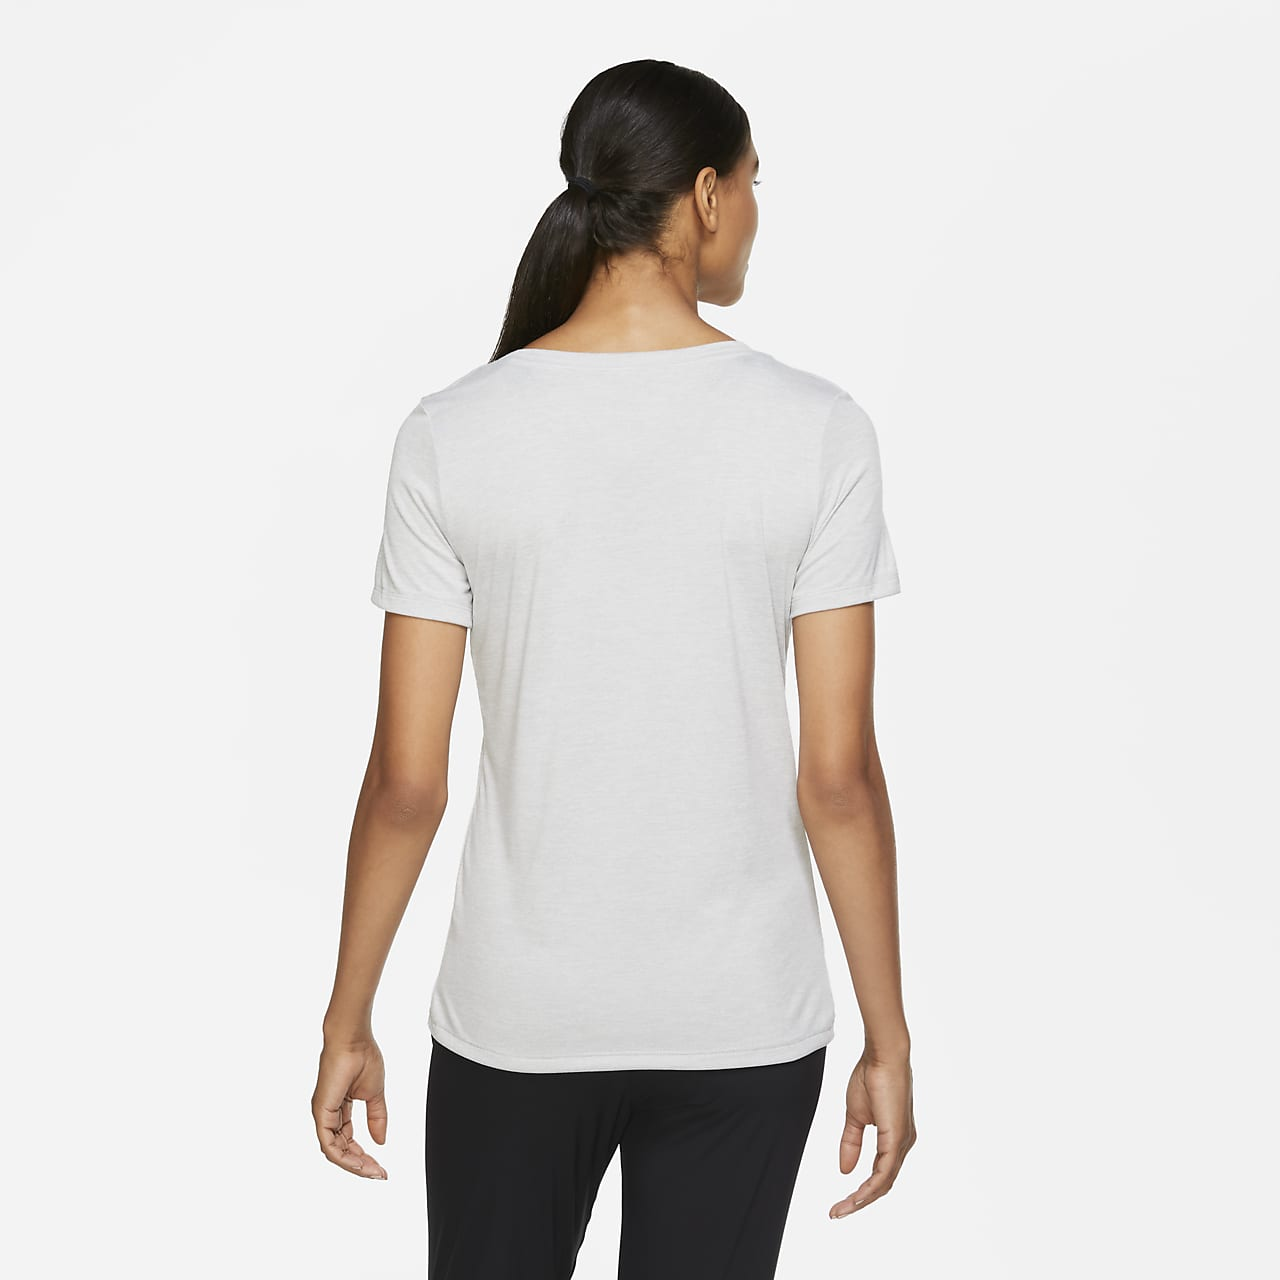 bb7fdb3caa9 Nike Dry Women's Training T-Shirt. Nike.com